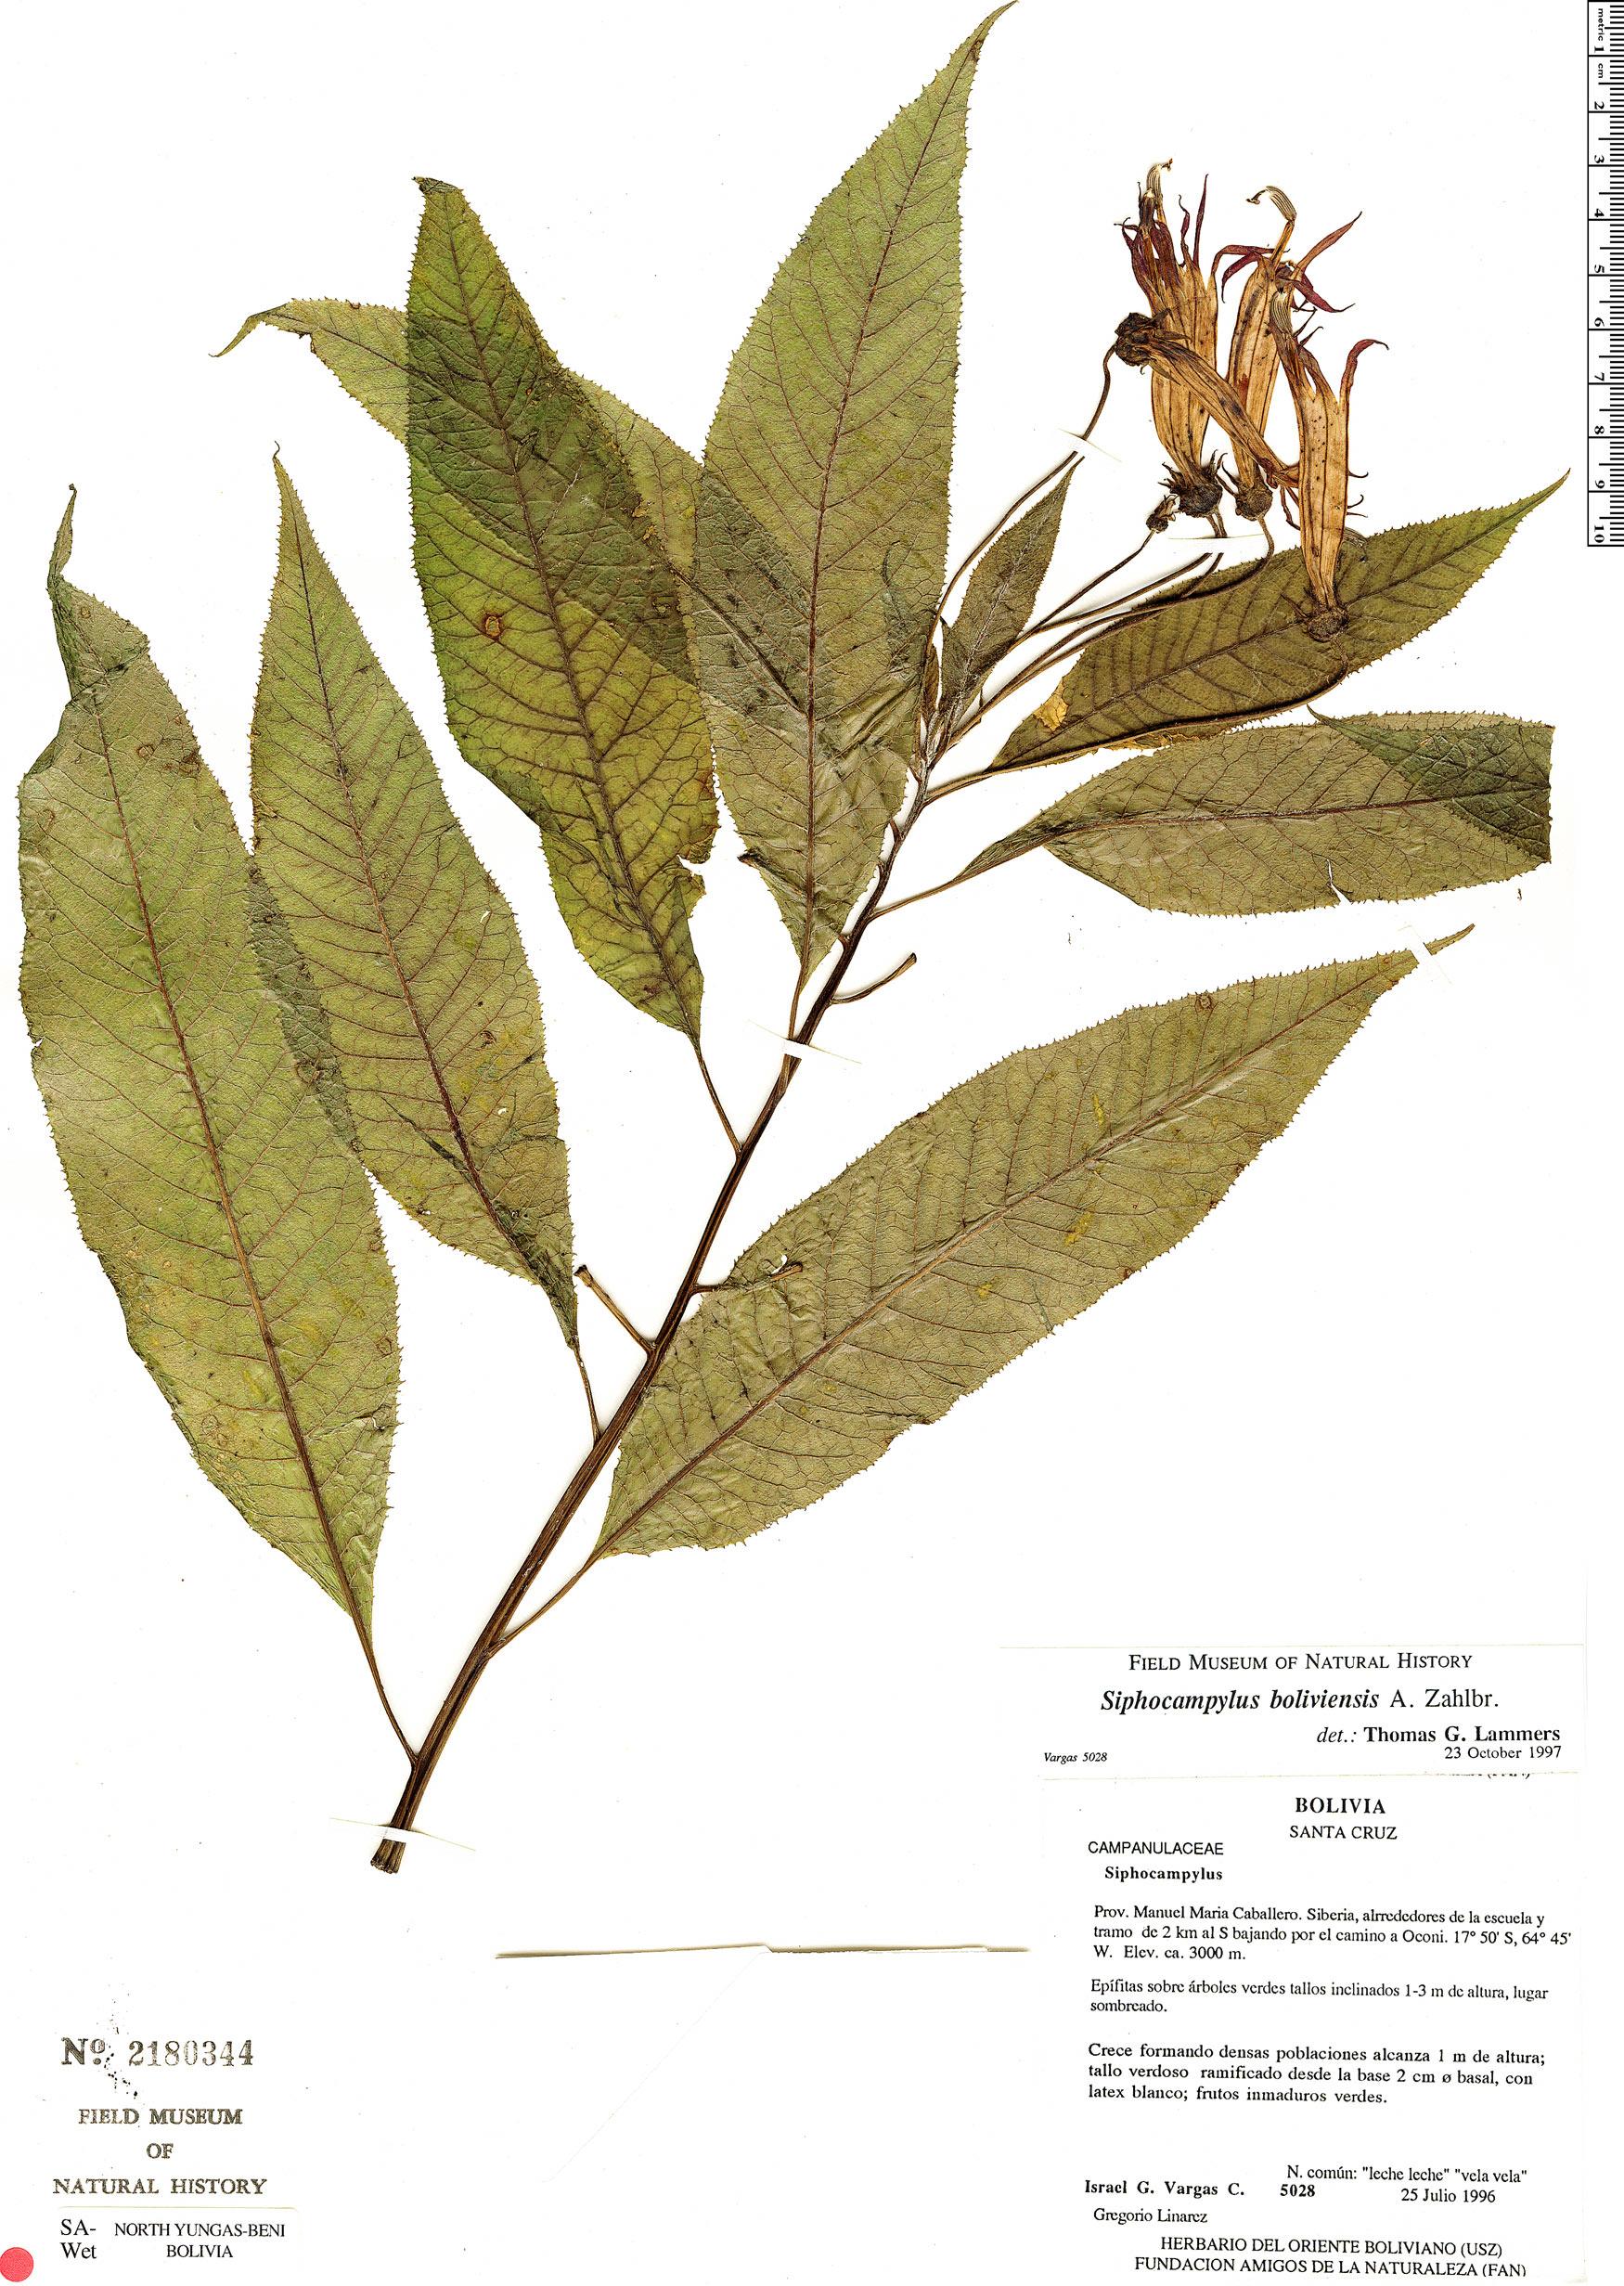 Specimen: Siphocampylus boliviensis